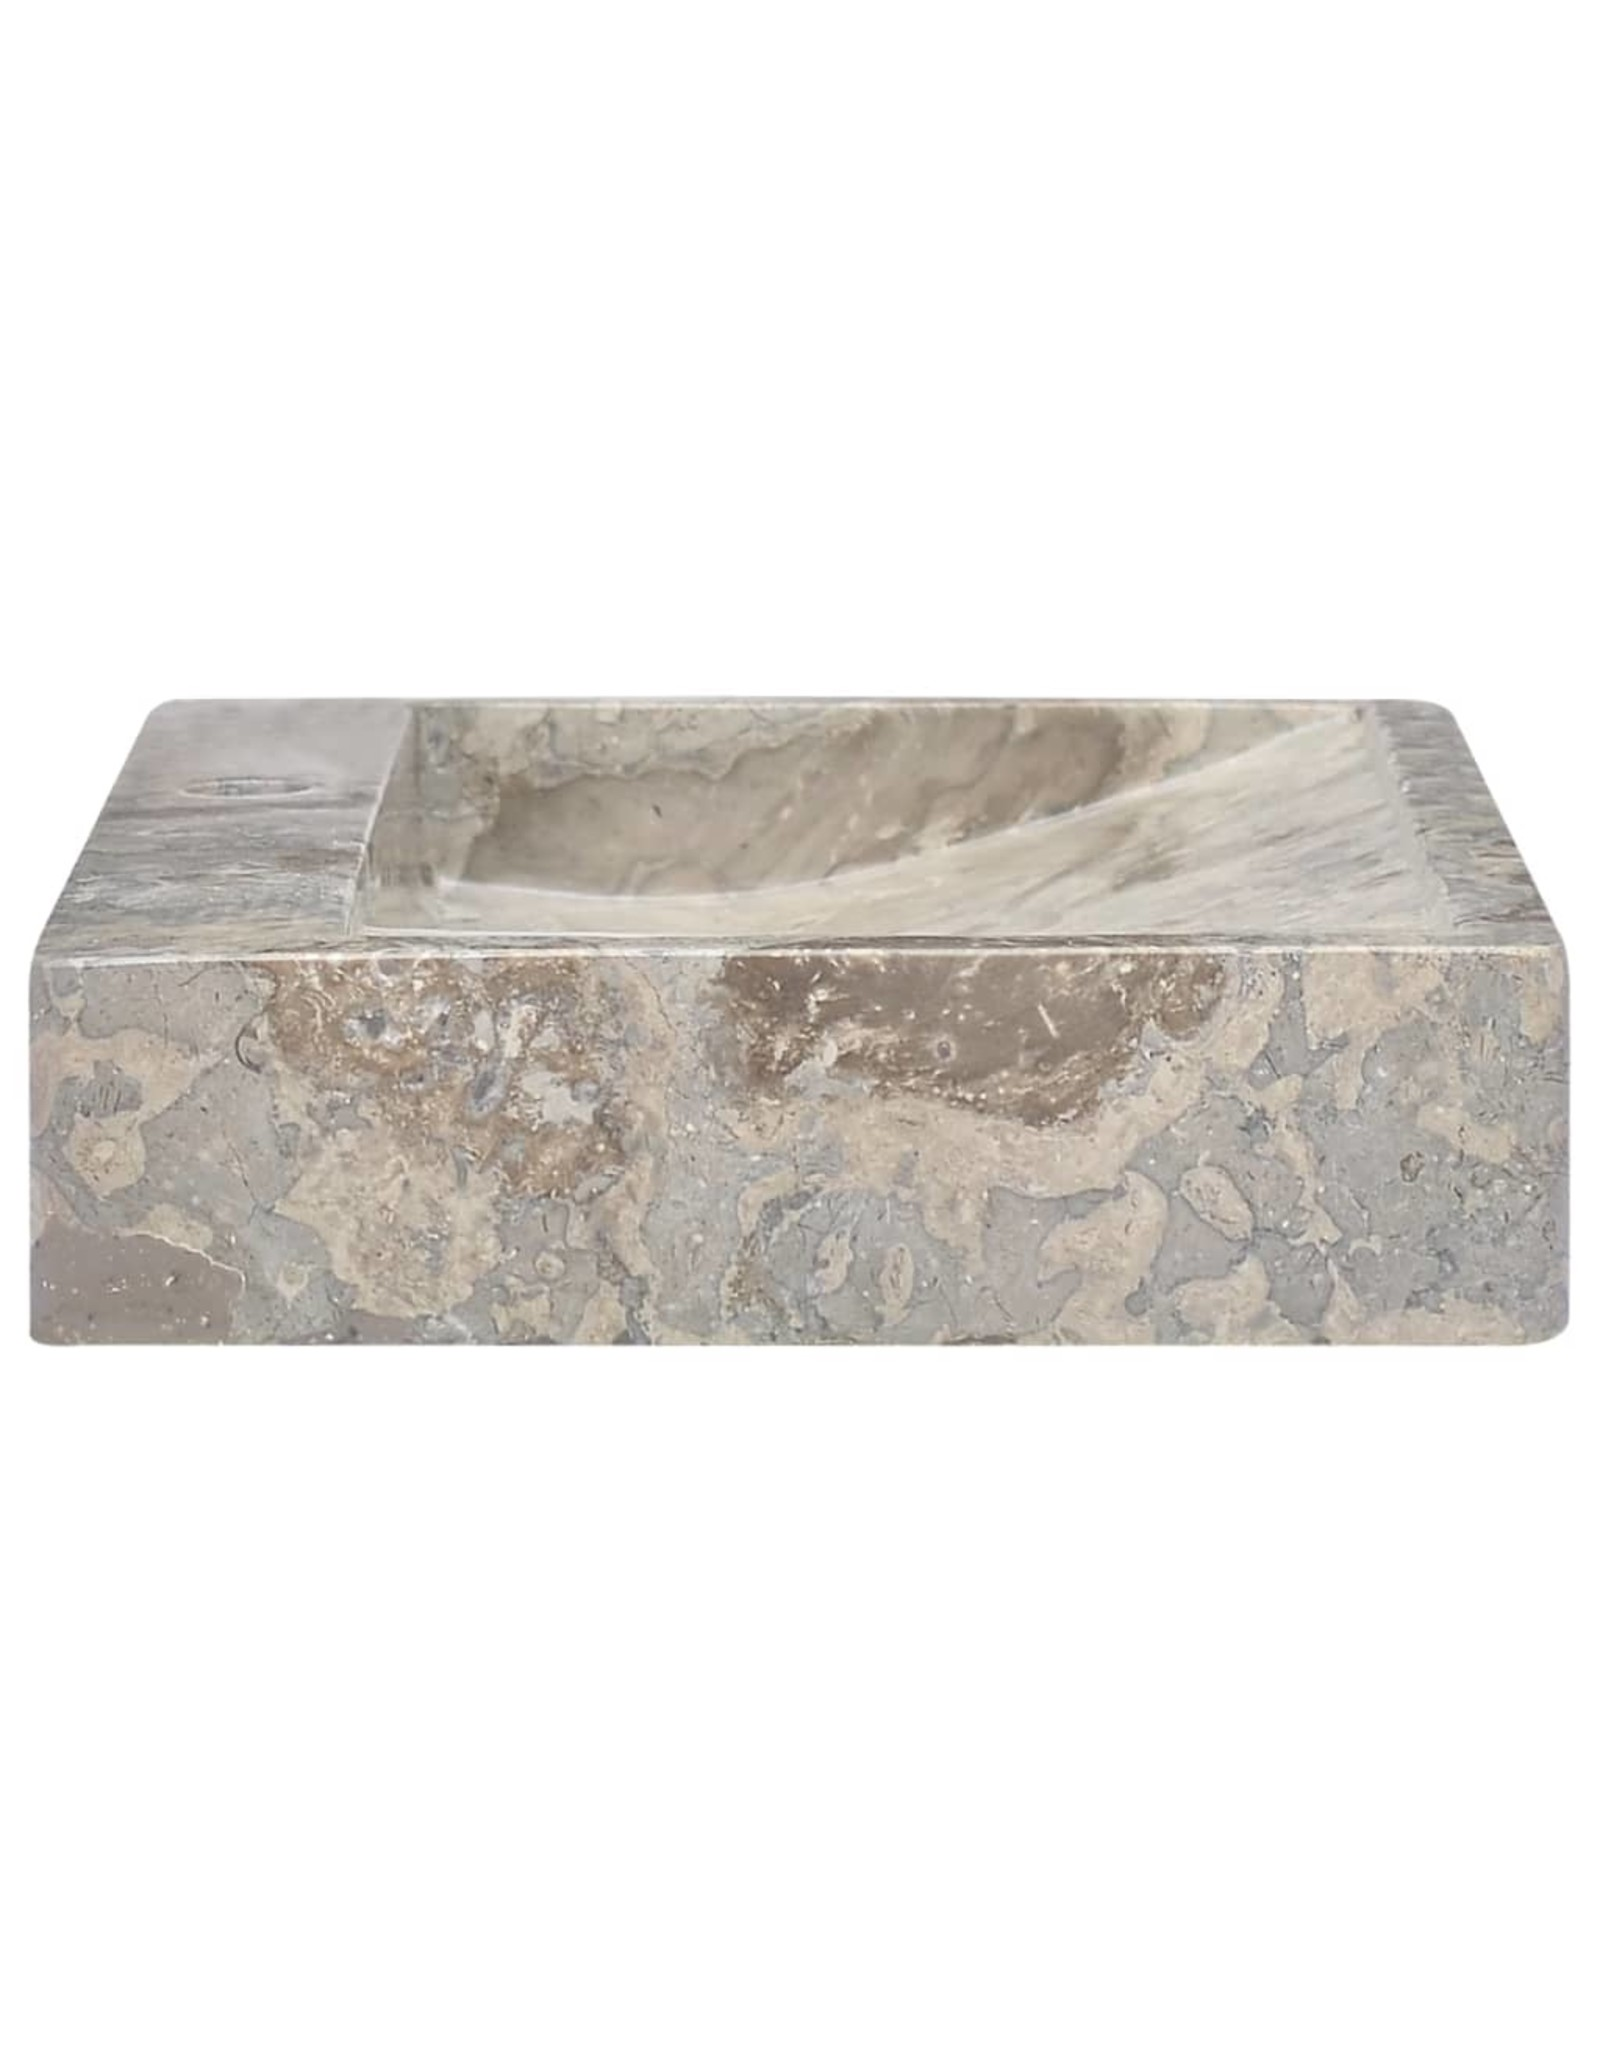 Gootsteen 58x39x10 cm marmer grijs